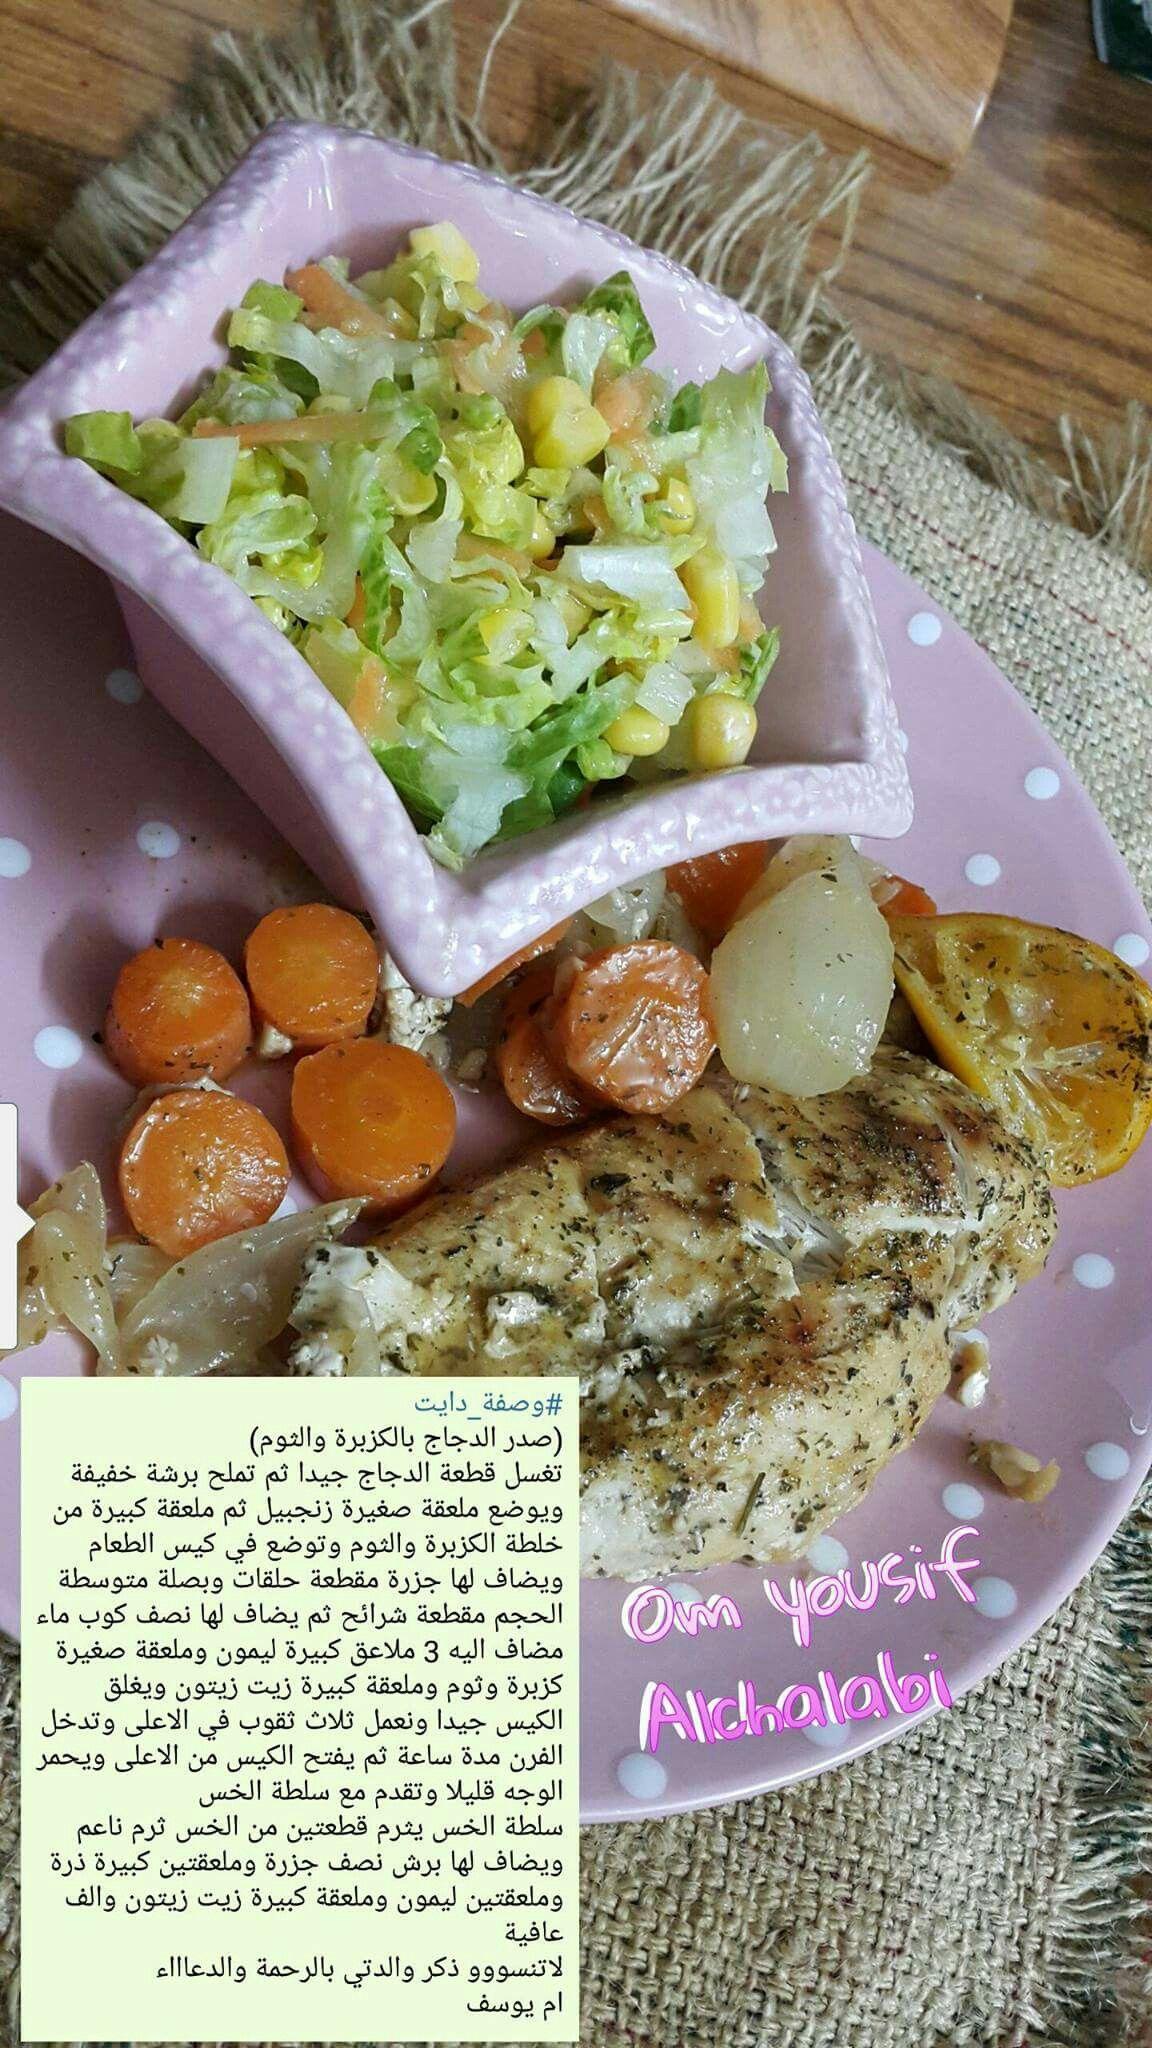 Pin By Heba El Gretly On Rejeem ريجيم Health Food Healty Food Healthy Recipes